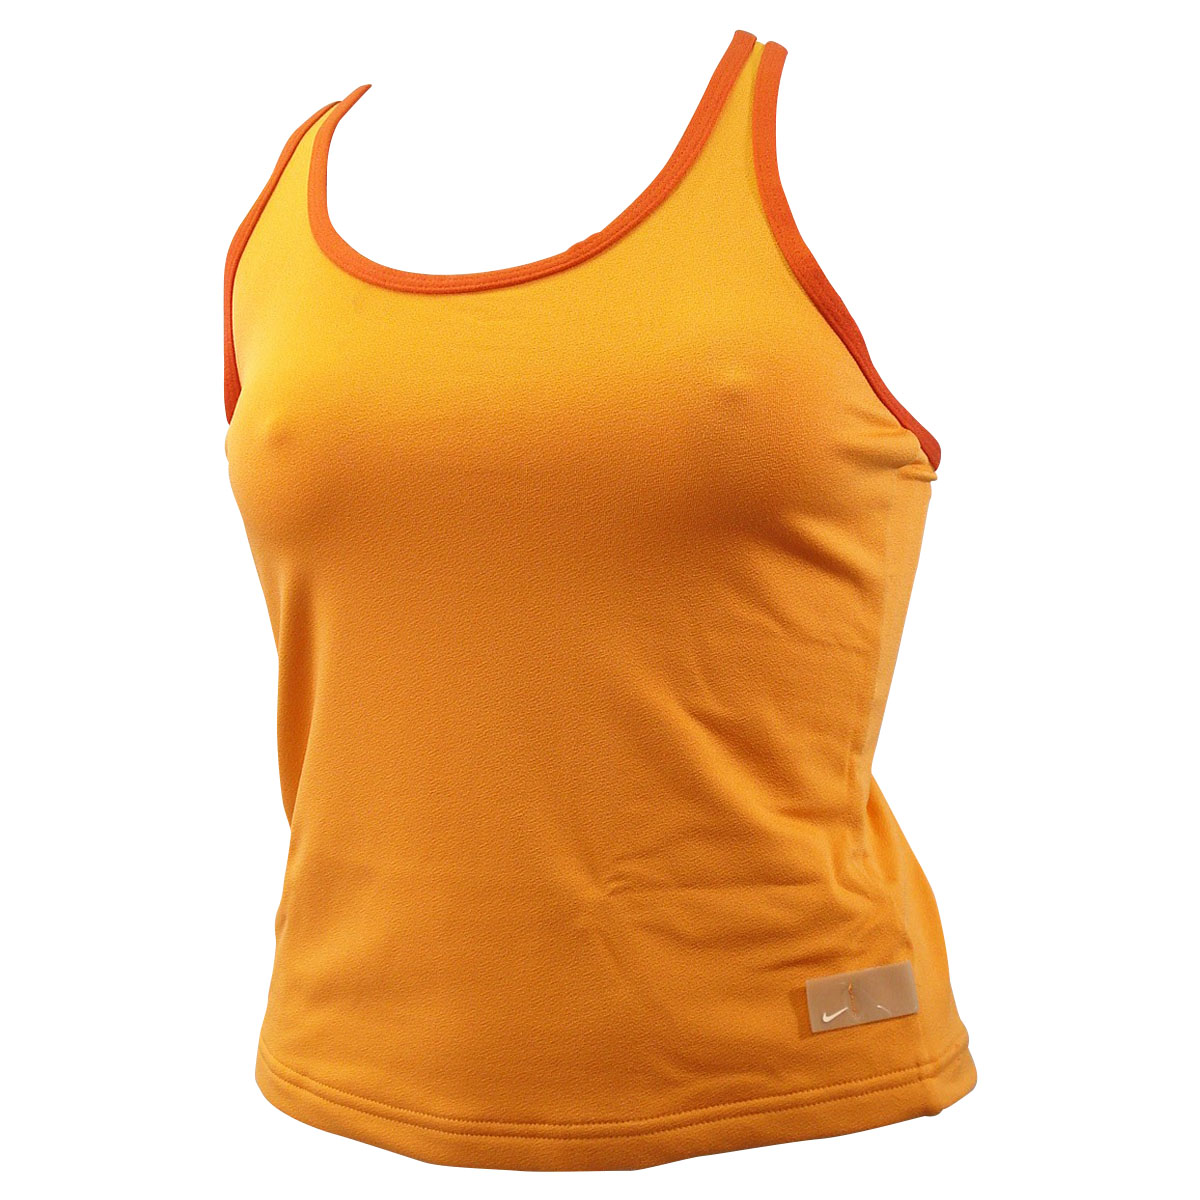 Womens Nike Dry Dri FIT Running Shirt Vest Top Tee Ladies Gym Training T-Shirt